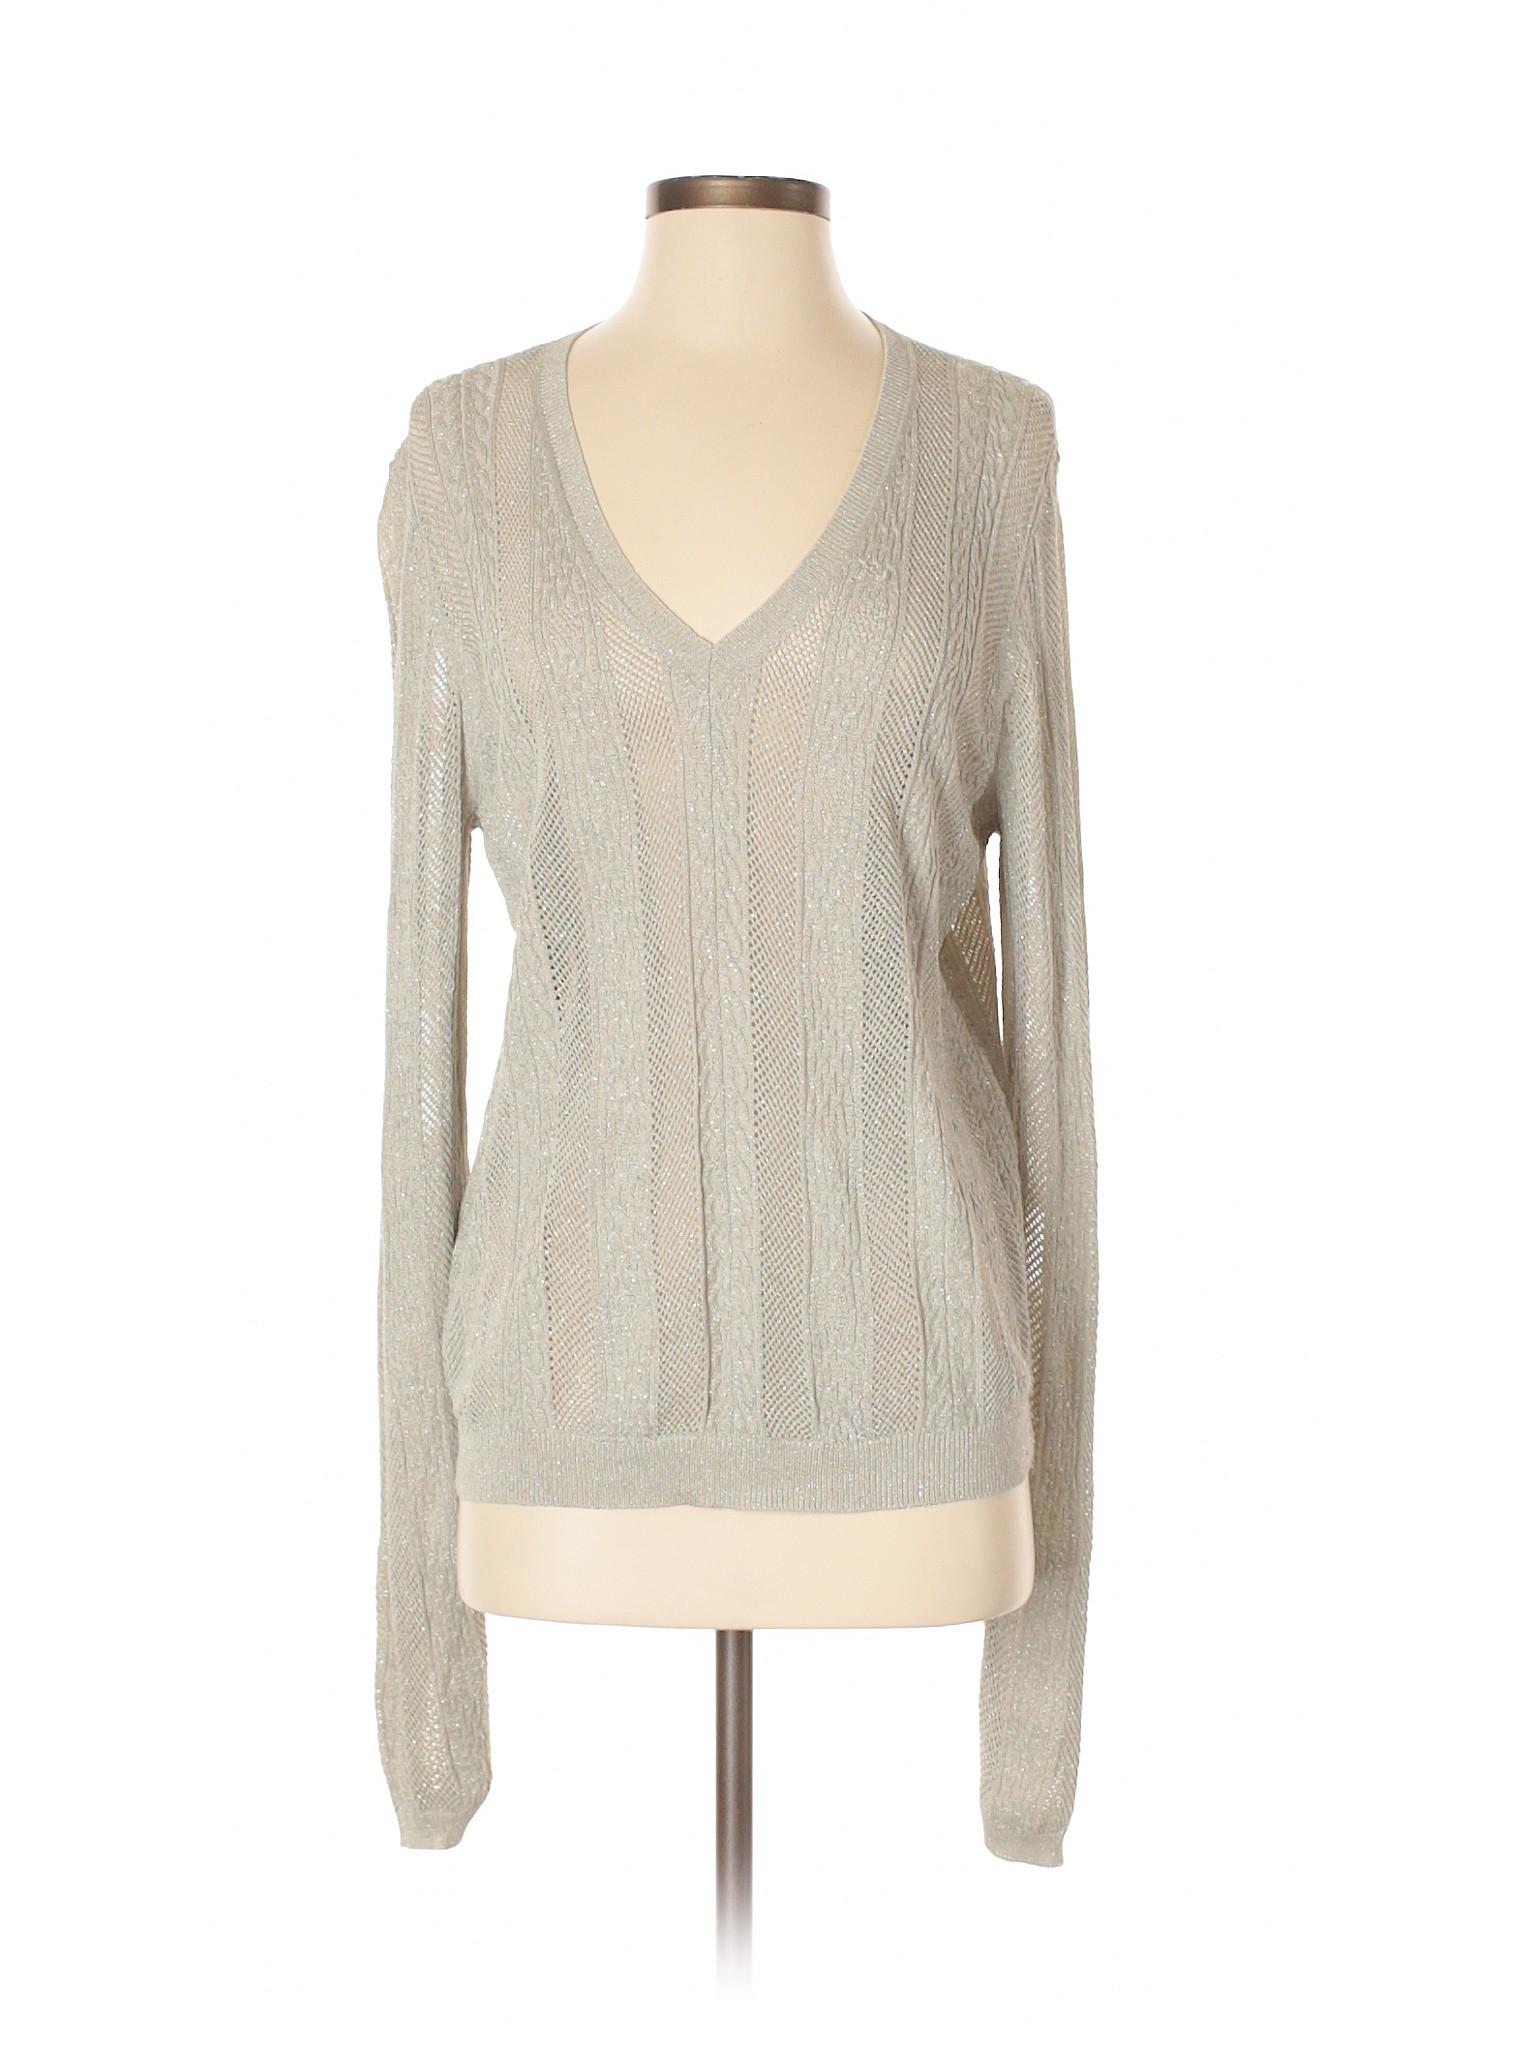 Boutique Helmut Sweater Pullover Lang Pullover Boutique Lang Helmut rwZr6qv